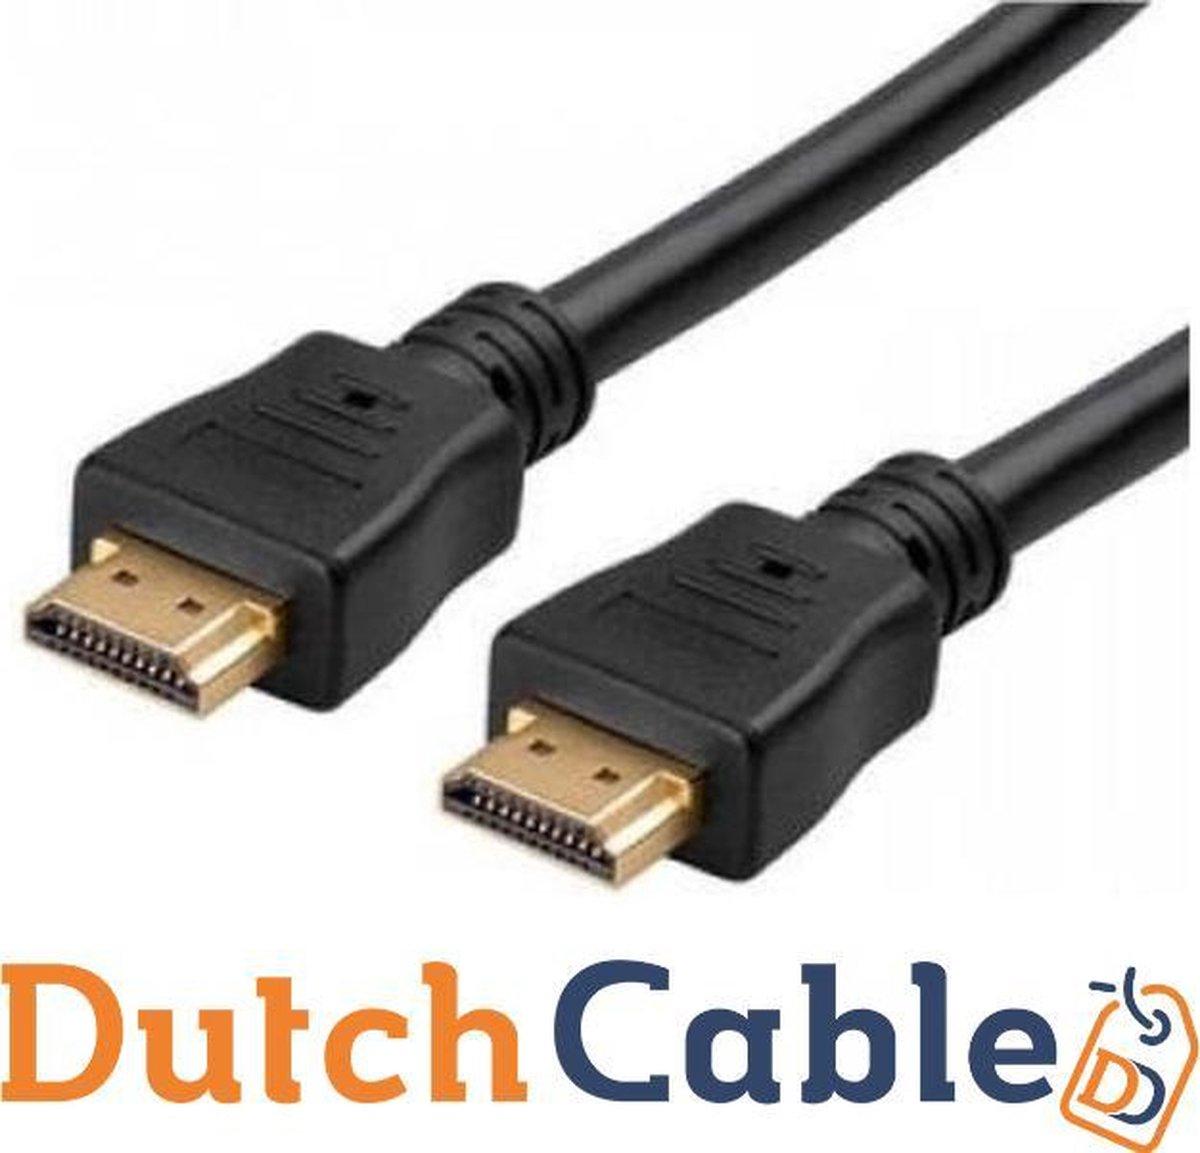 Dutch Cable HDMI 2.0 0,5 meter 4K